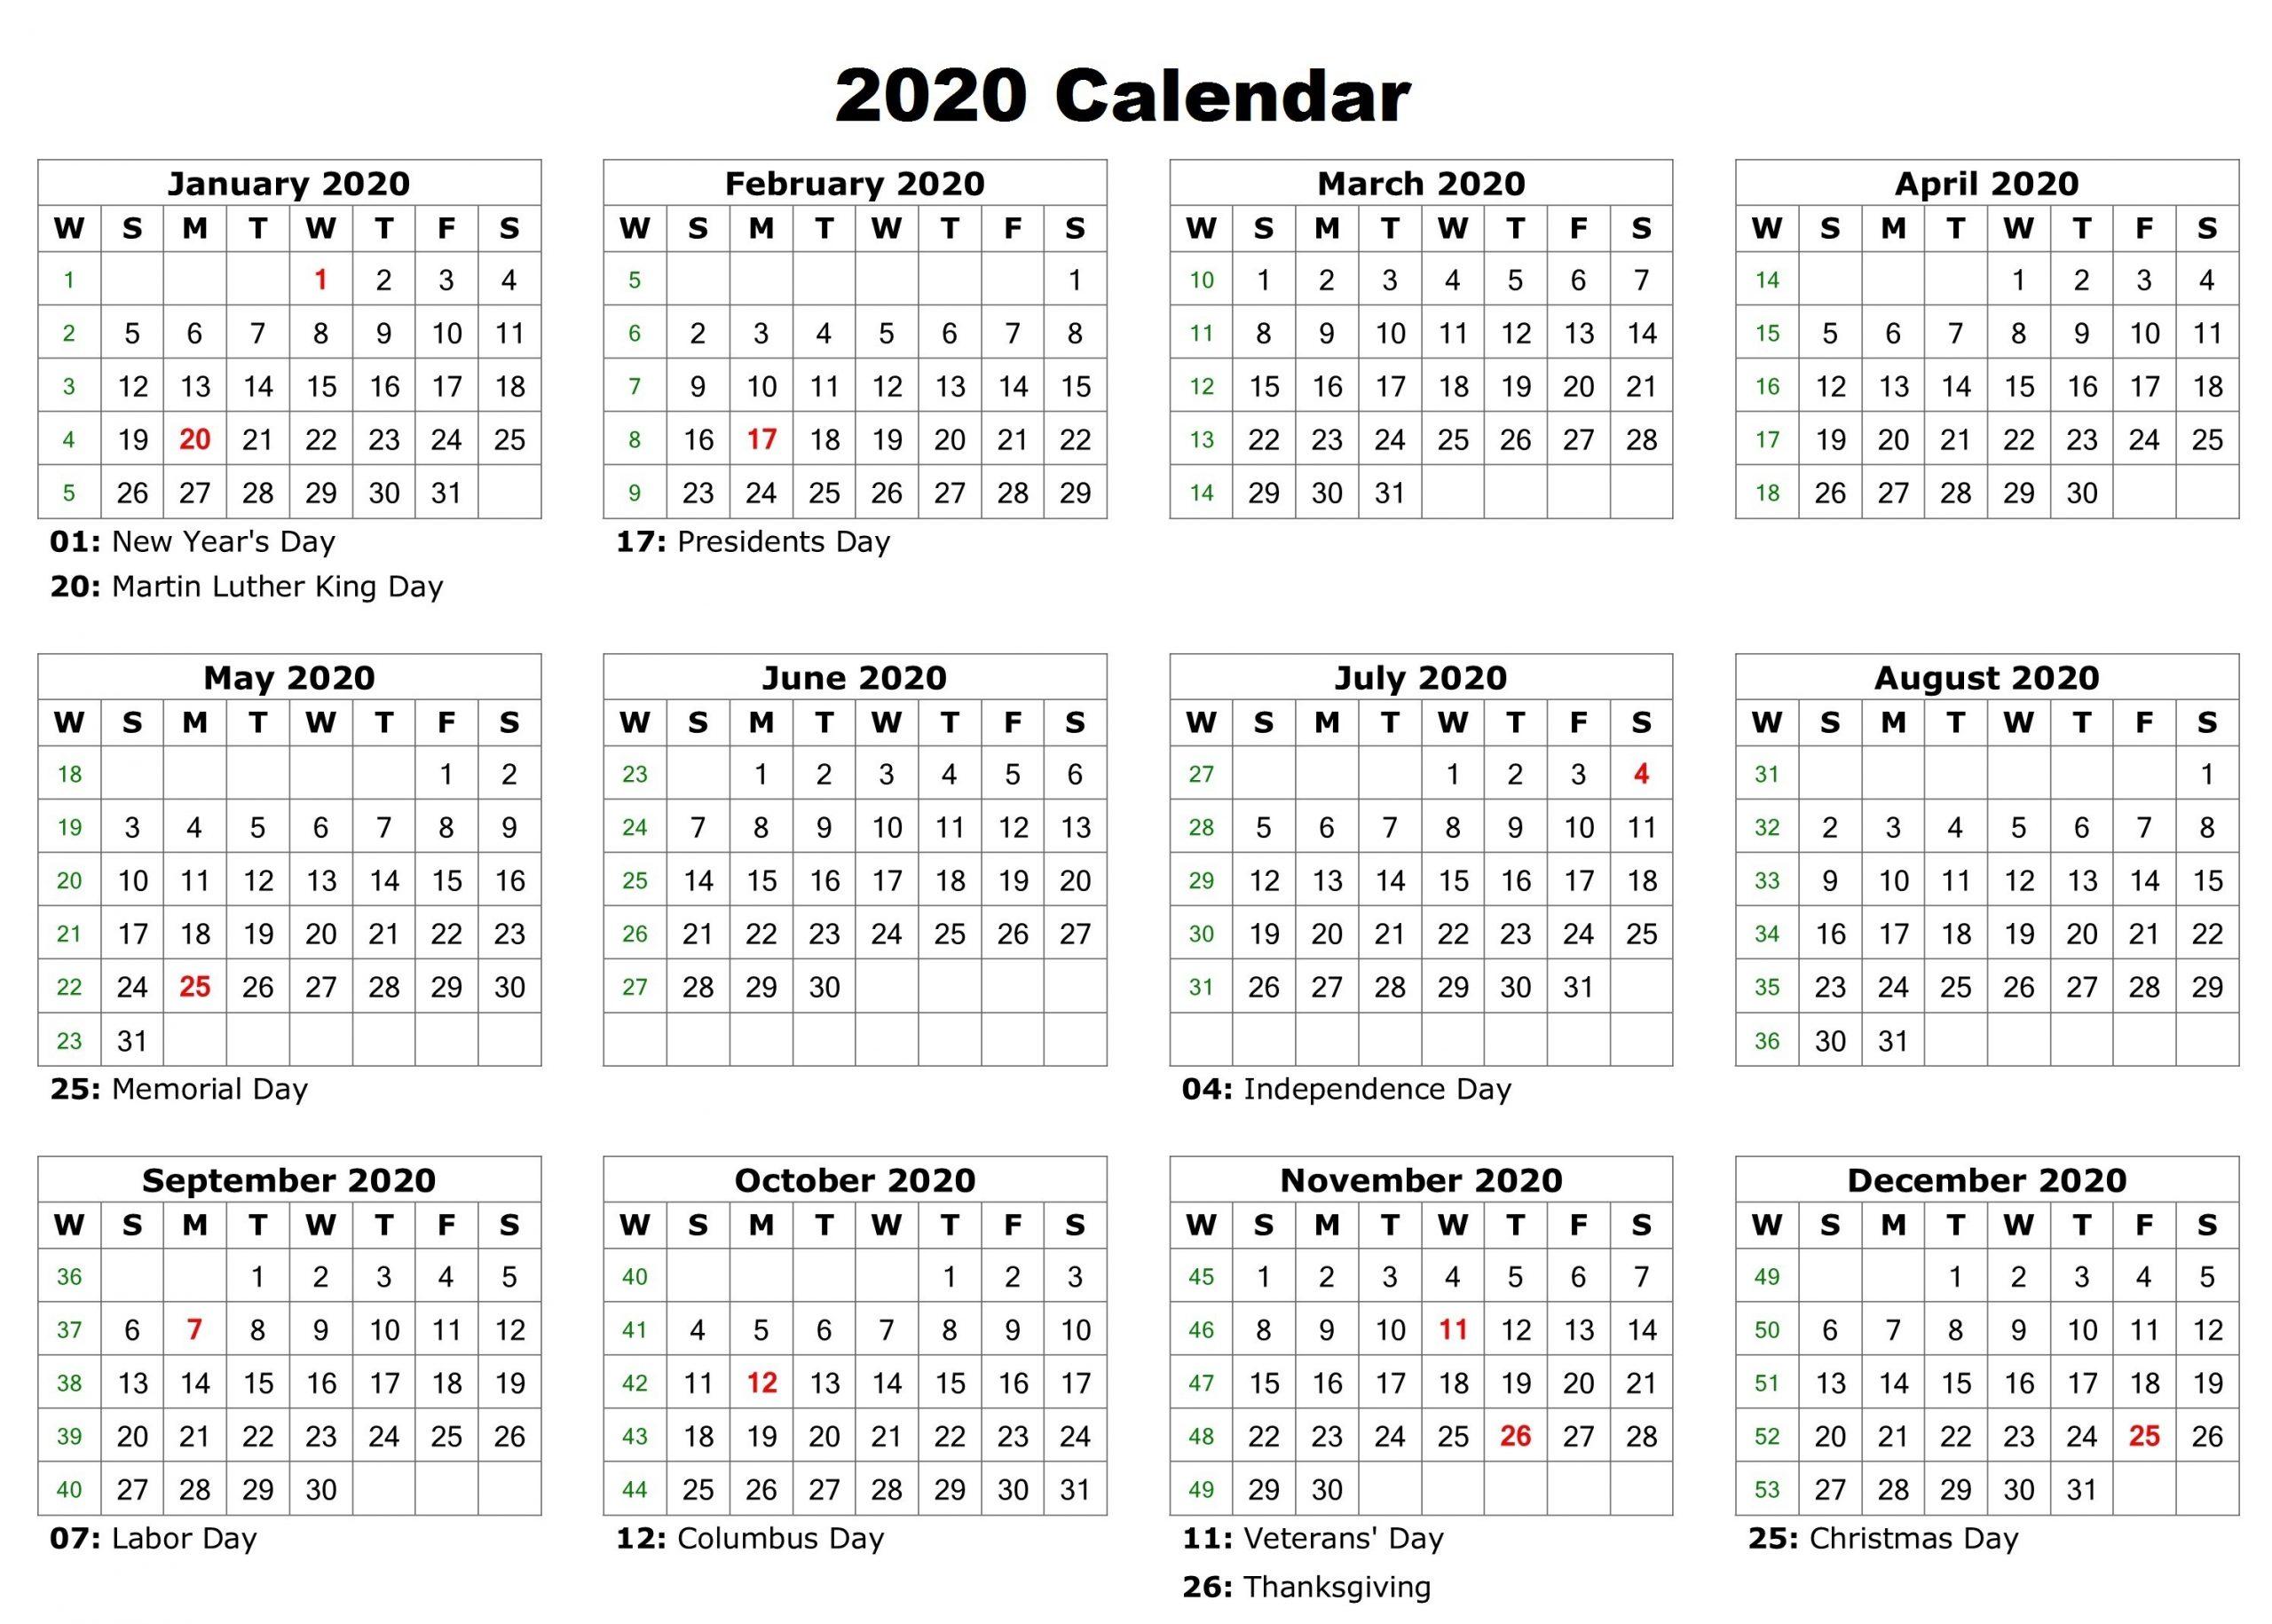 Free 12 Month 2020 Calendar With Holidays - Jackby - Medium